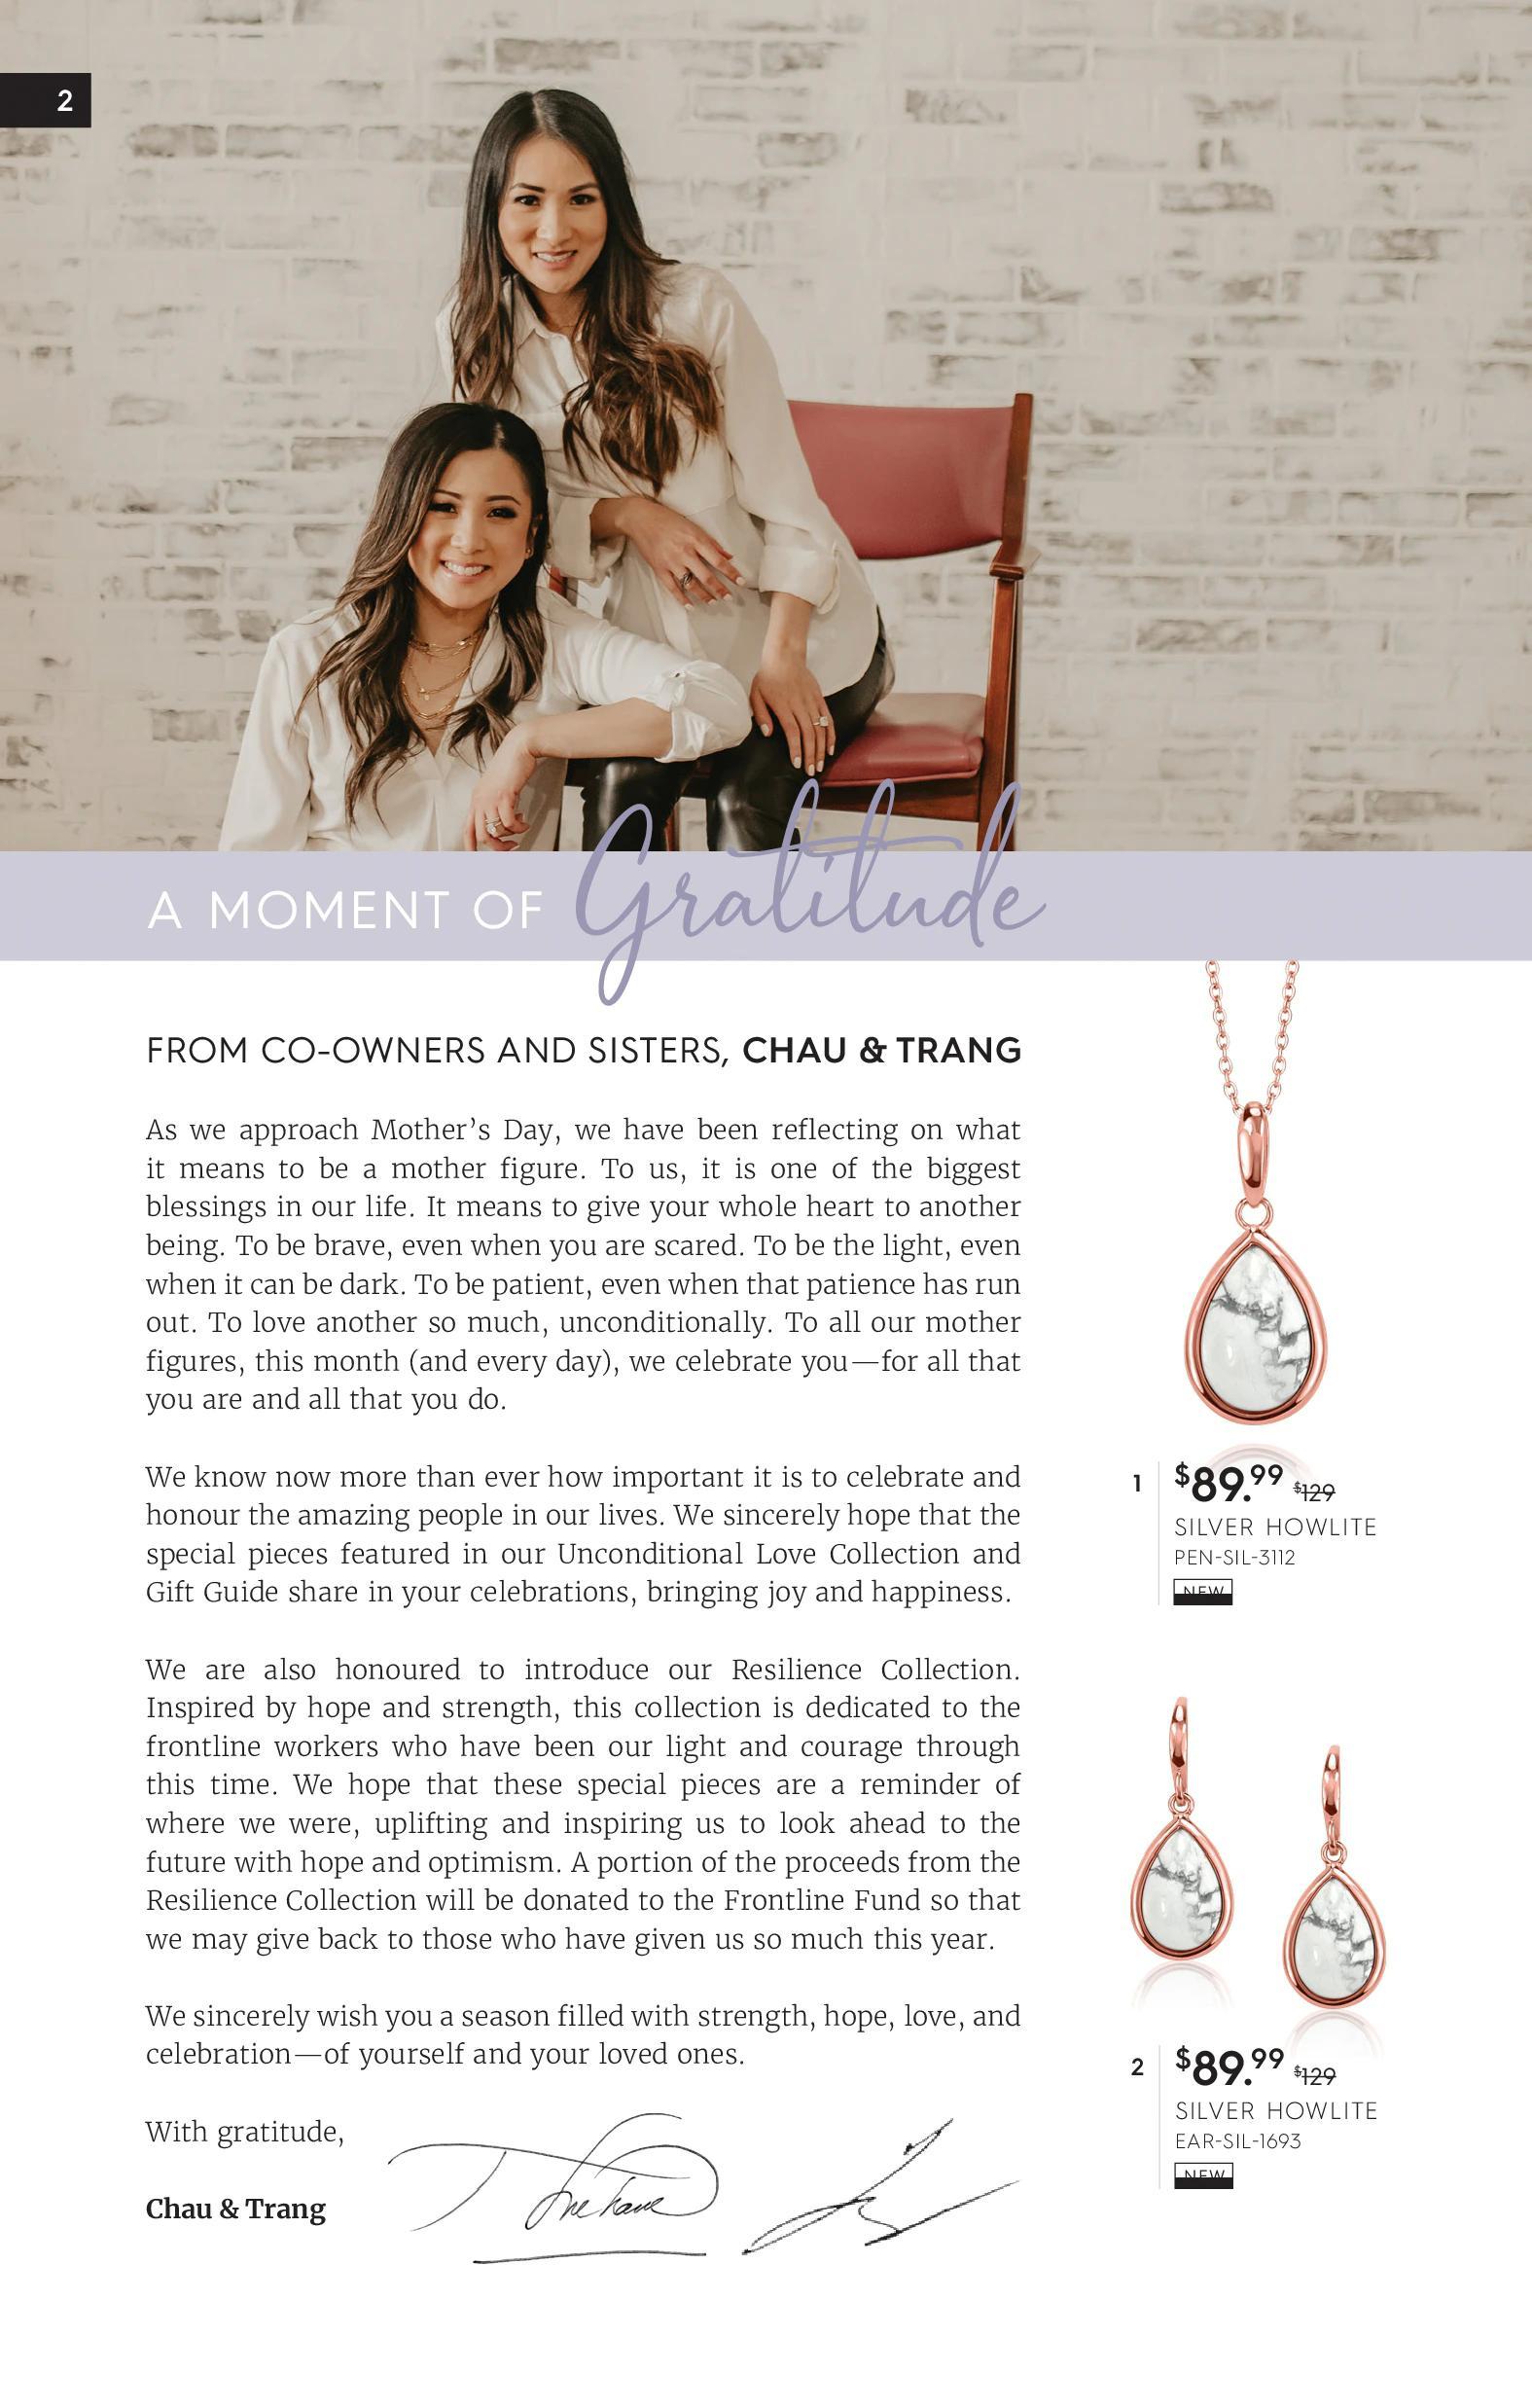 Paris Jewellers - Monthly Savings - Page 2